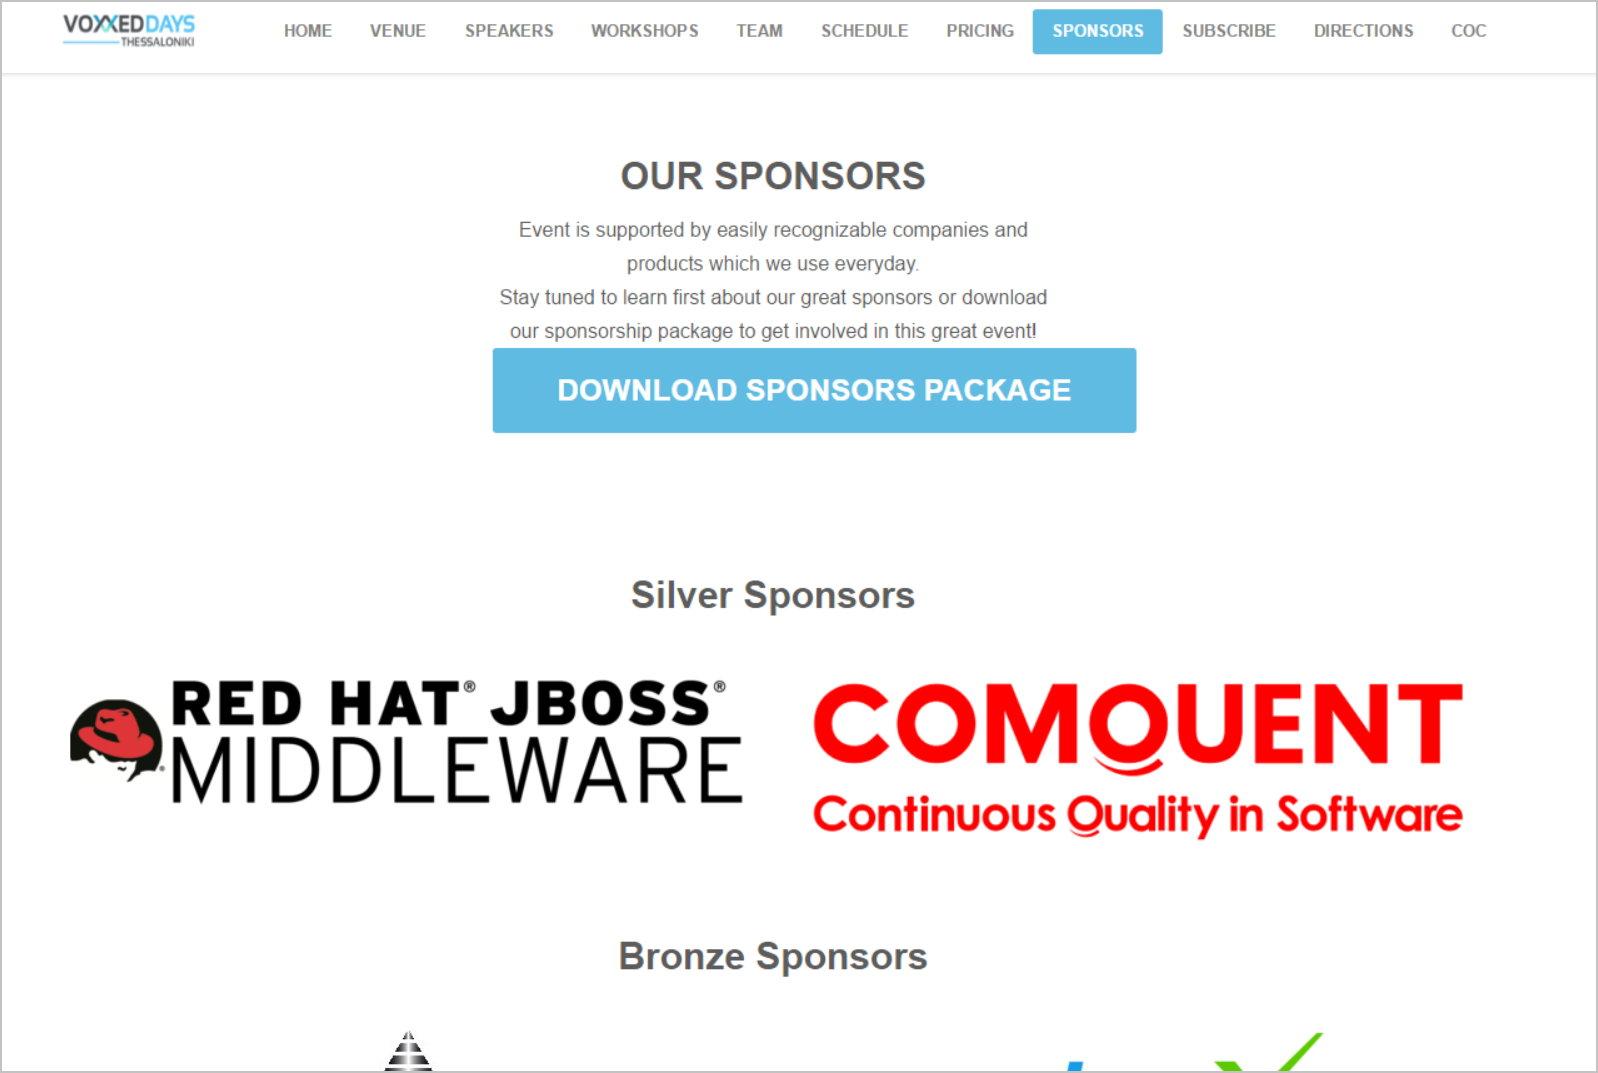 , Comquent und RedHat sind Silver Sponsors der VOXXED DAYS THESSALONIKI, Comquent GmbH, Continuous Quality in Software